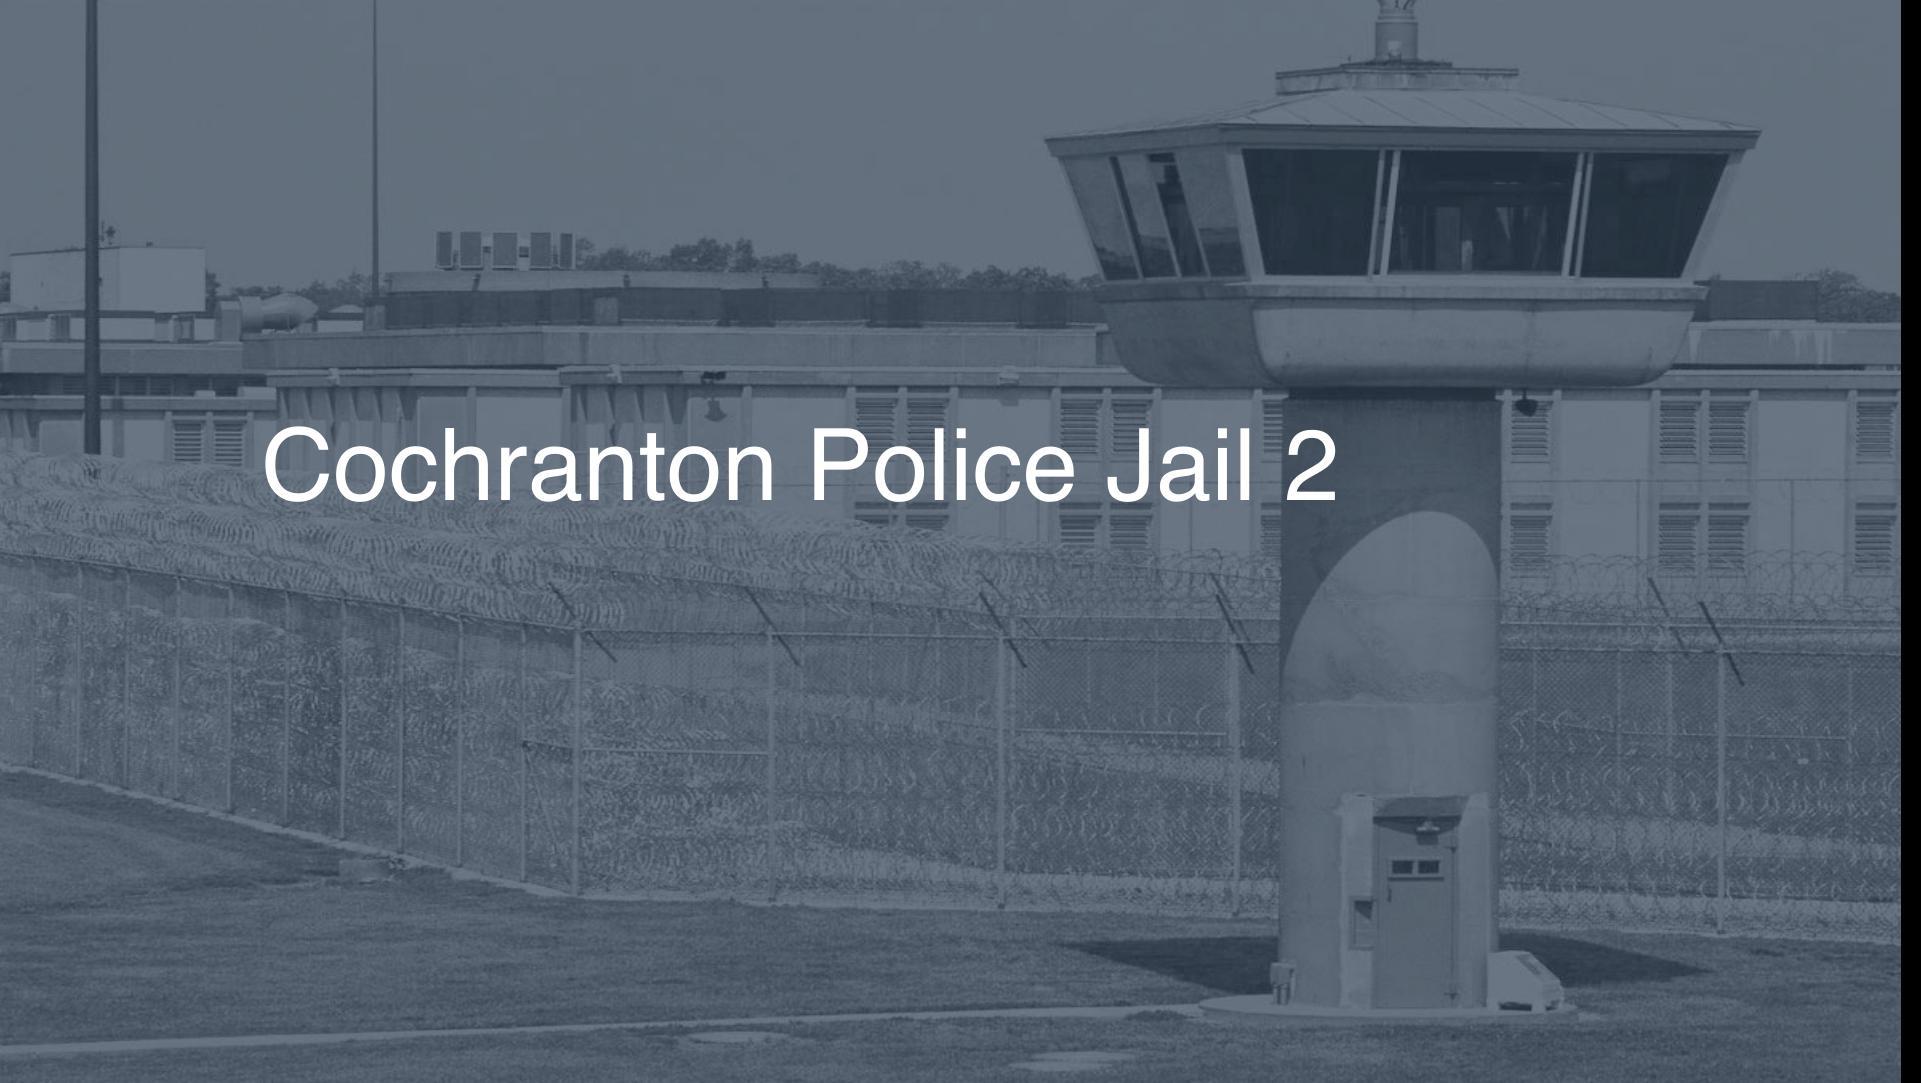 Cochranton Police Jail correctional facility picture